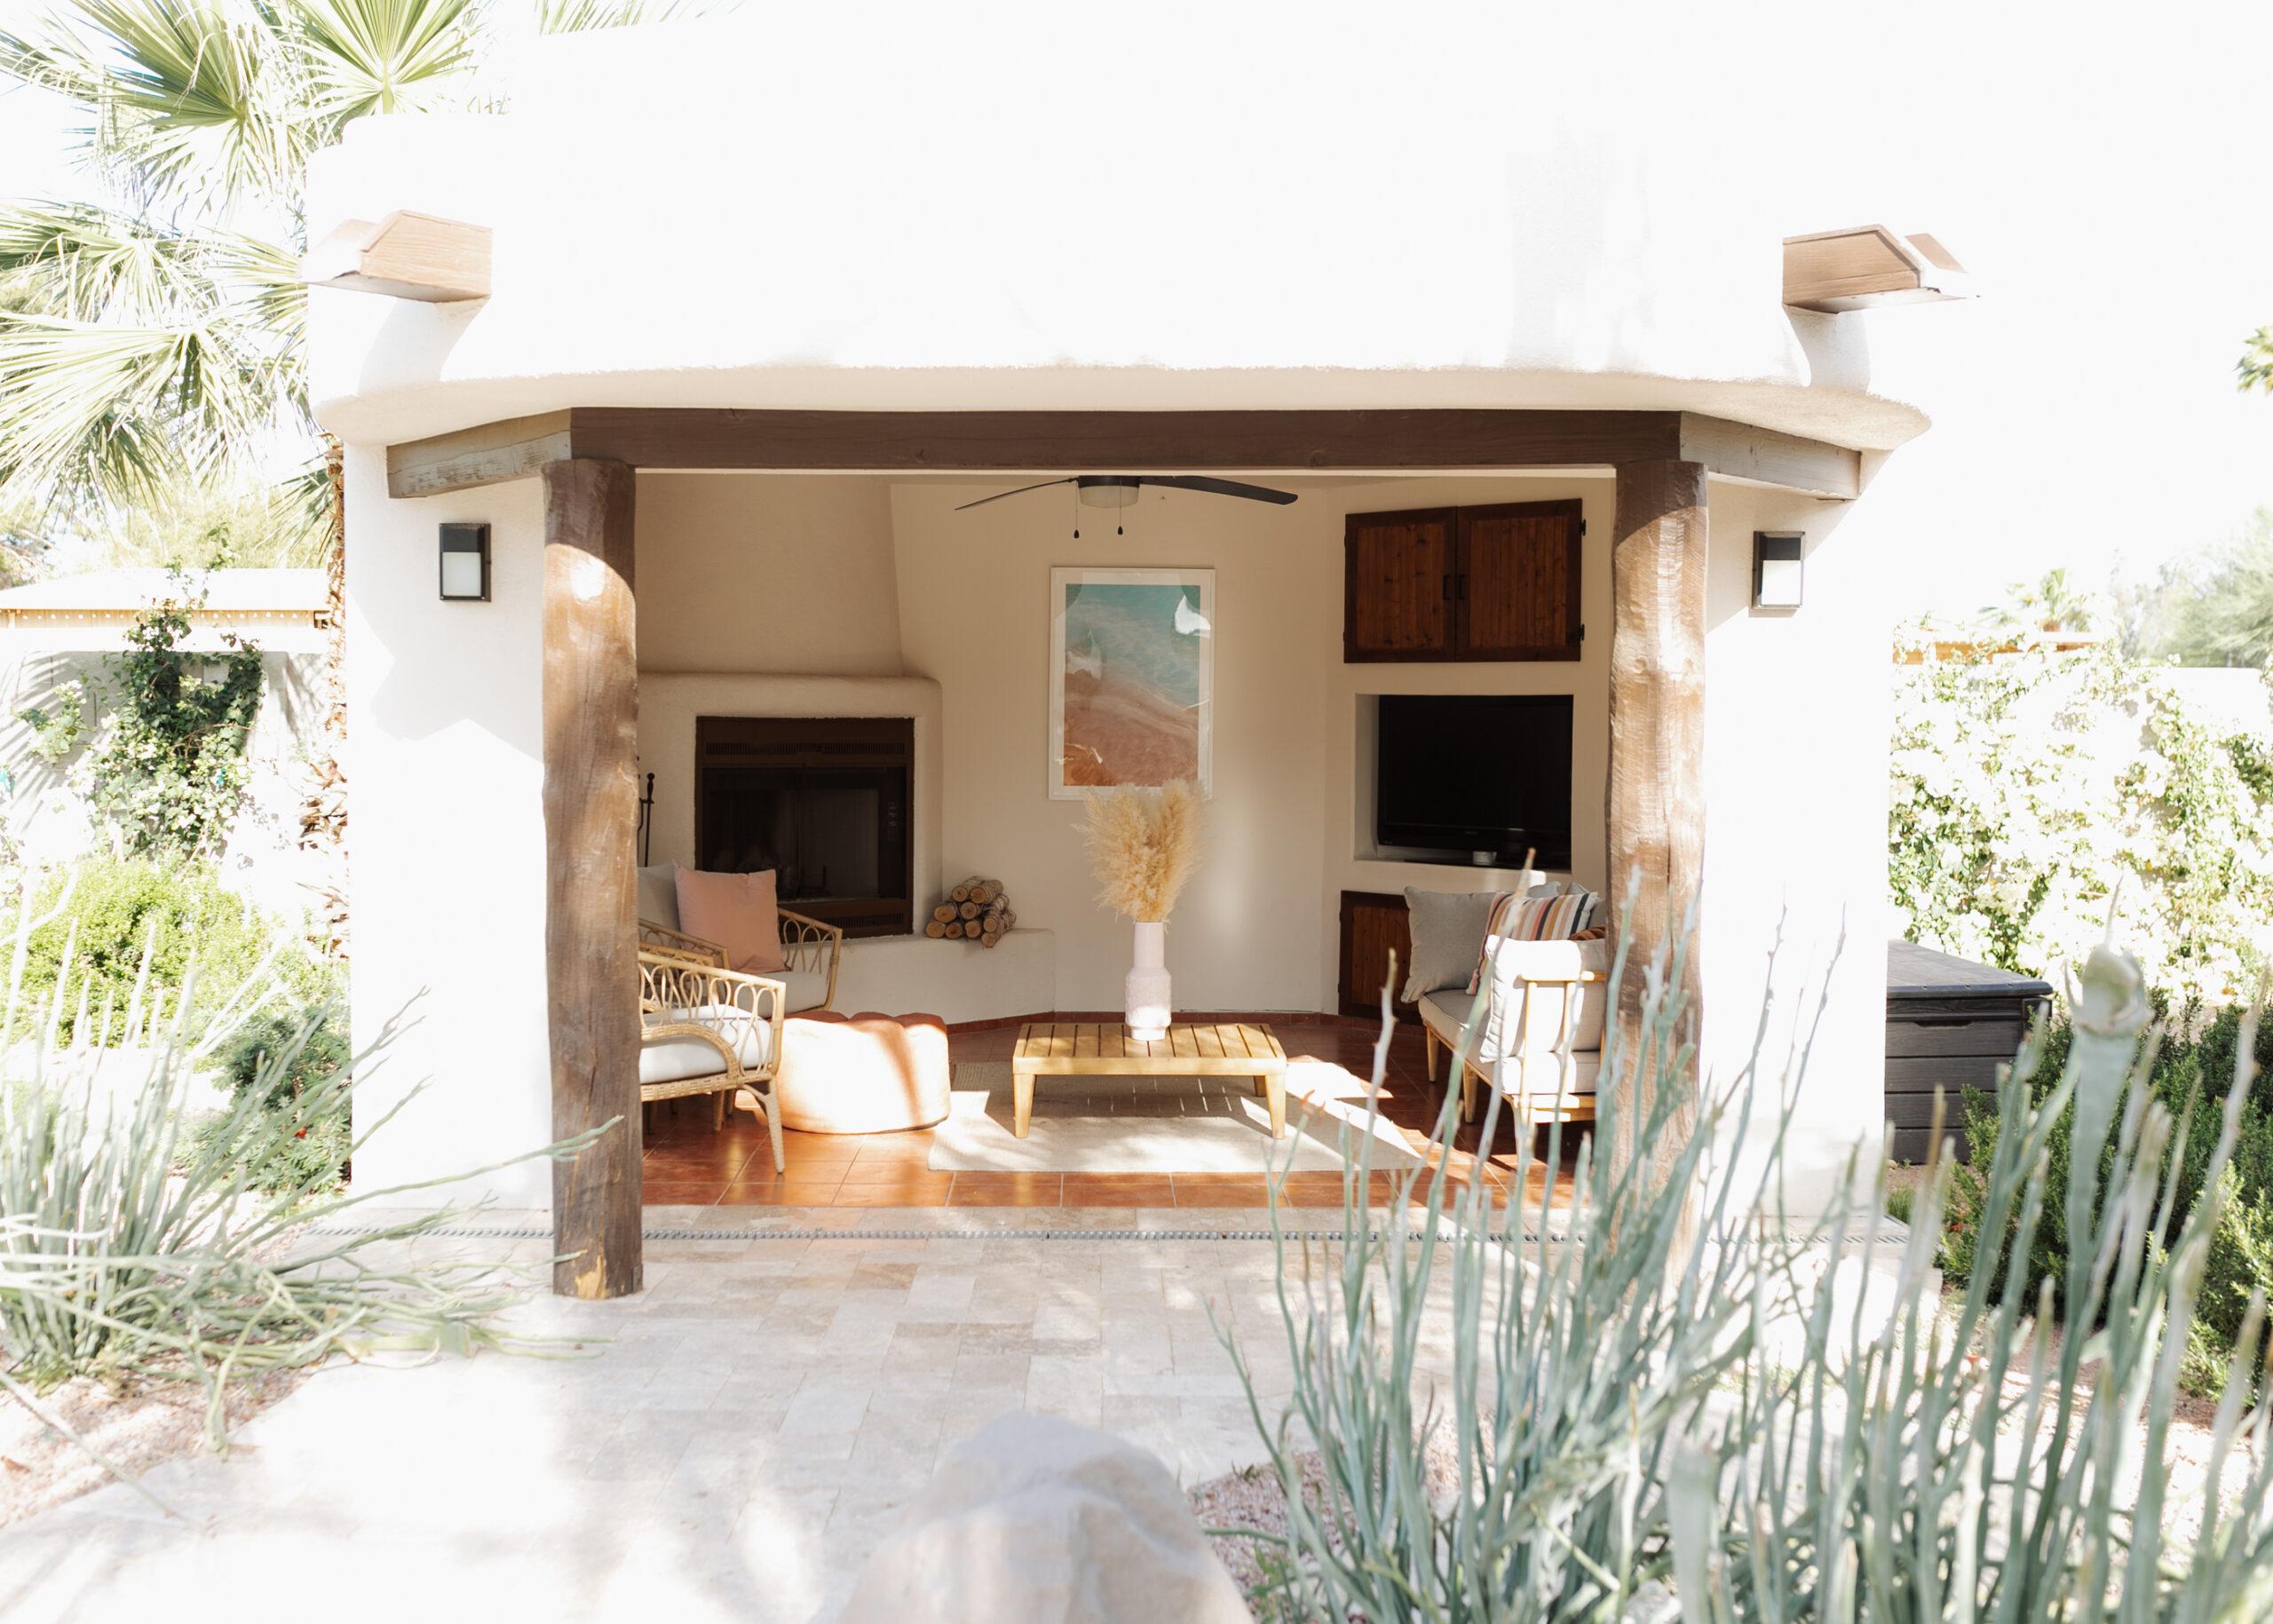 a peek at our pool ramada, with modern furniture and a beachy boho vibe #modernbackyard #arizonaliving #poolramada #backyarddesign